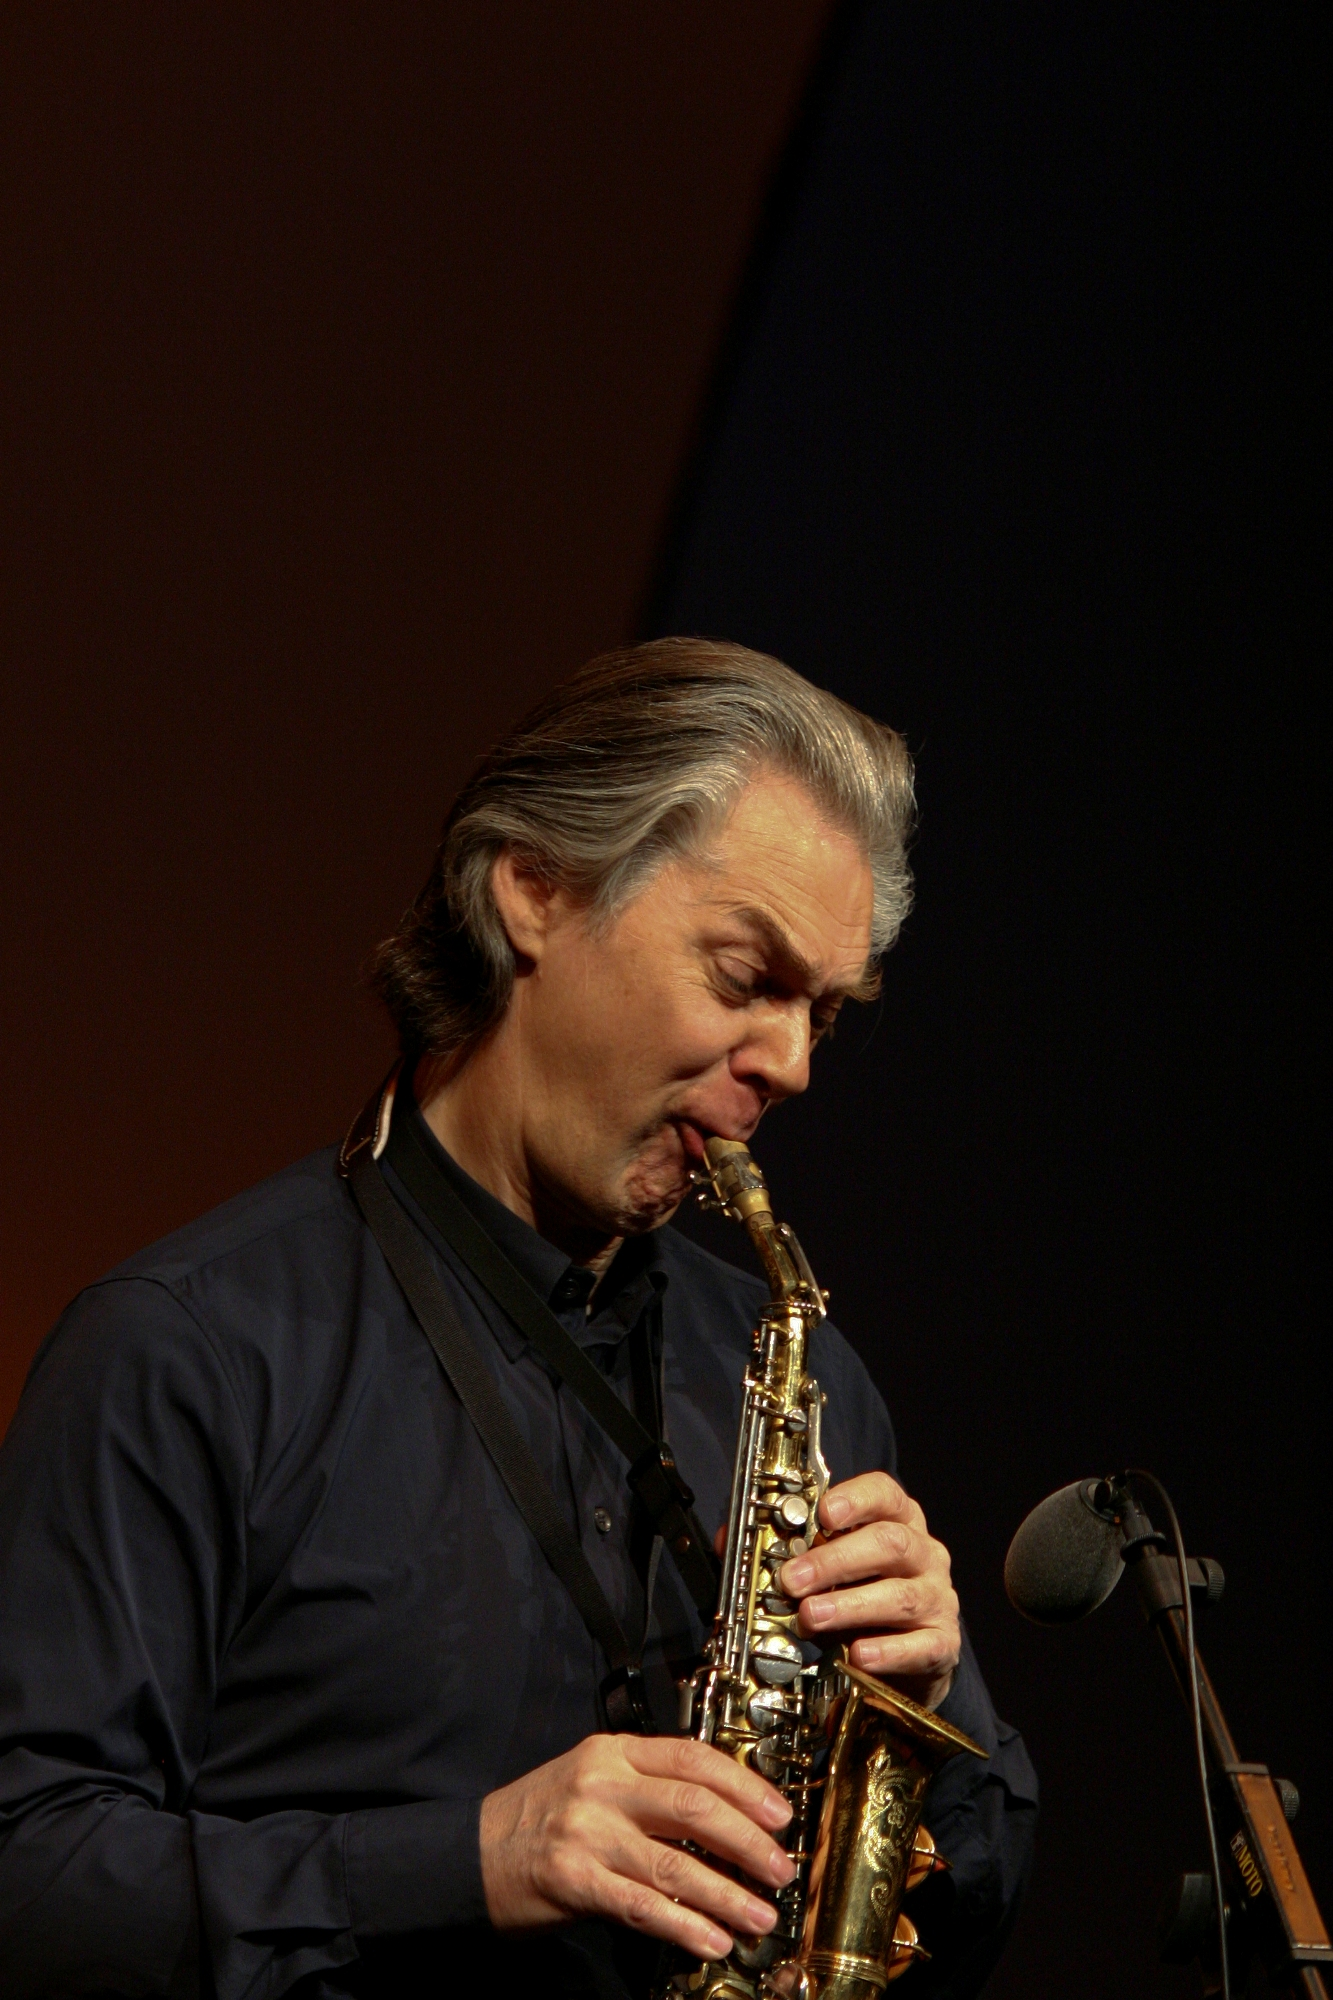 Jan Garbarek (Sopranosax) on Copemhagen Jazz Festival 2007, Denmark